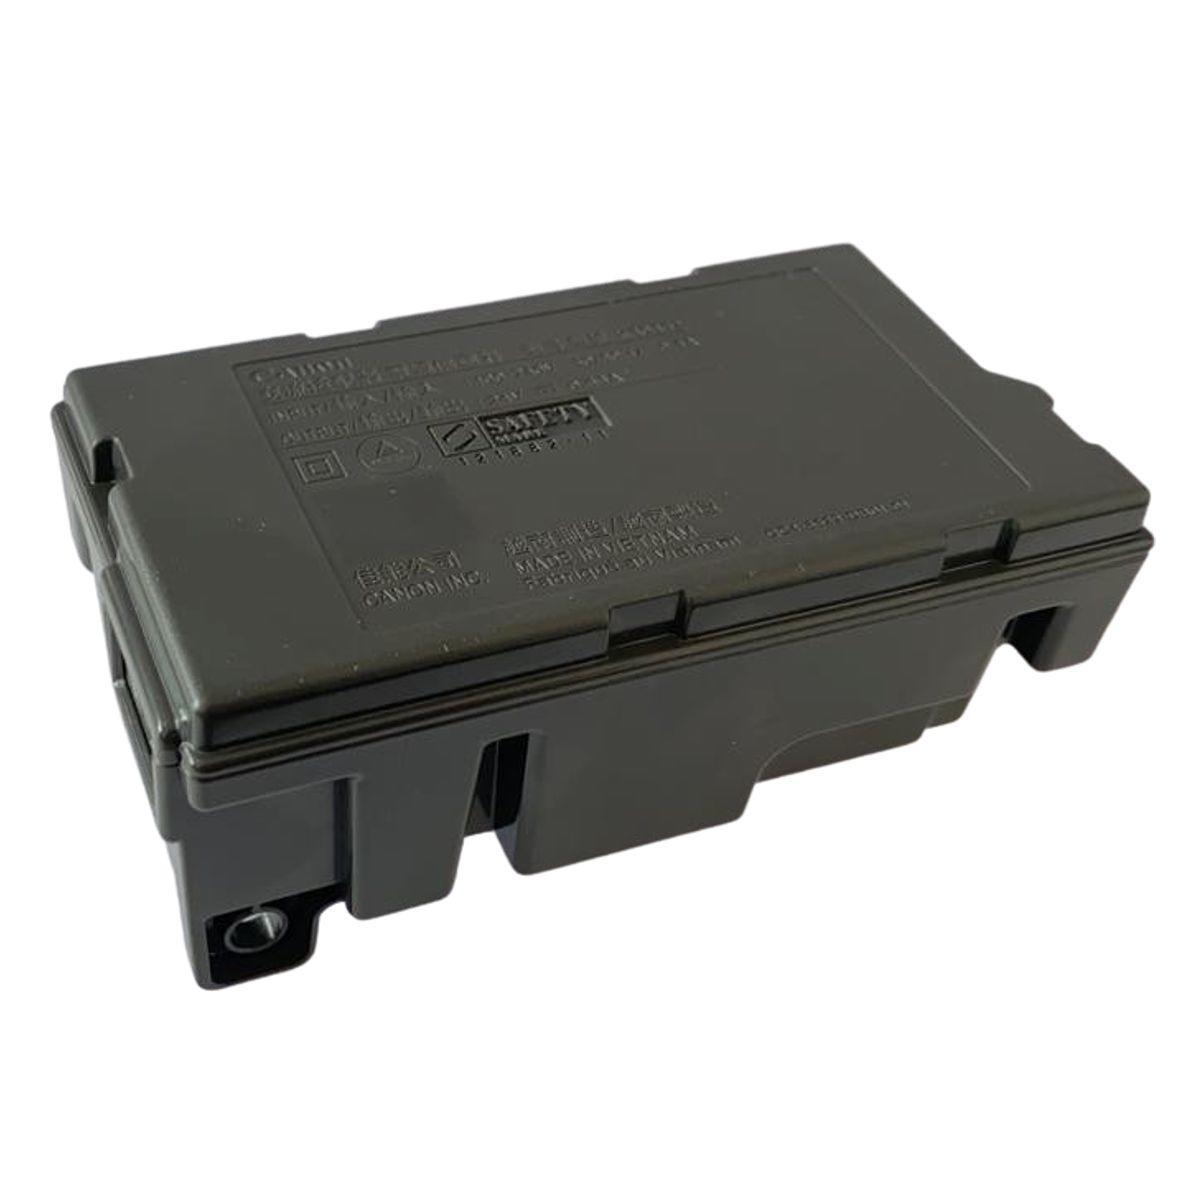 FONTE DE ENERGIA DA IMPRESSORA MULTIFUNCIONAL CANON MG2410 MG2510 MG2910 MG3010 - PN: K30352